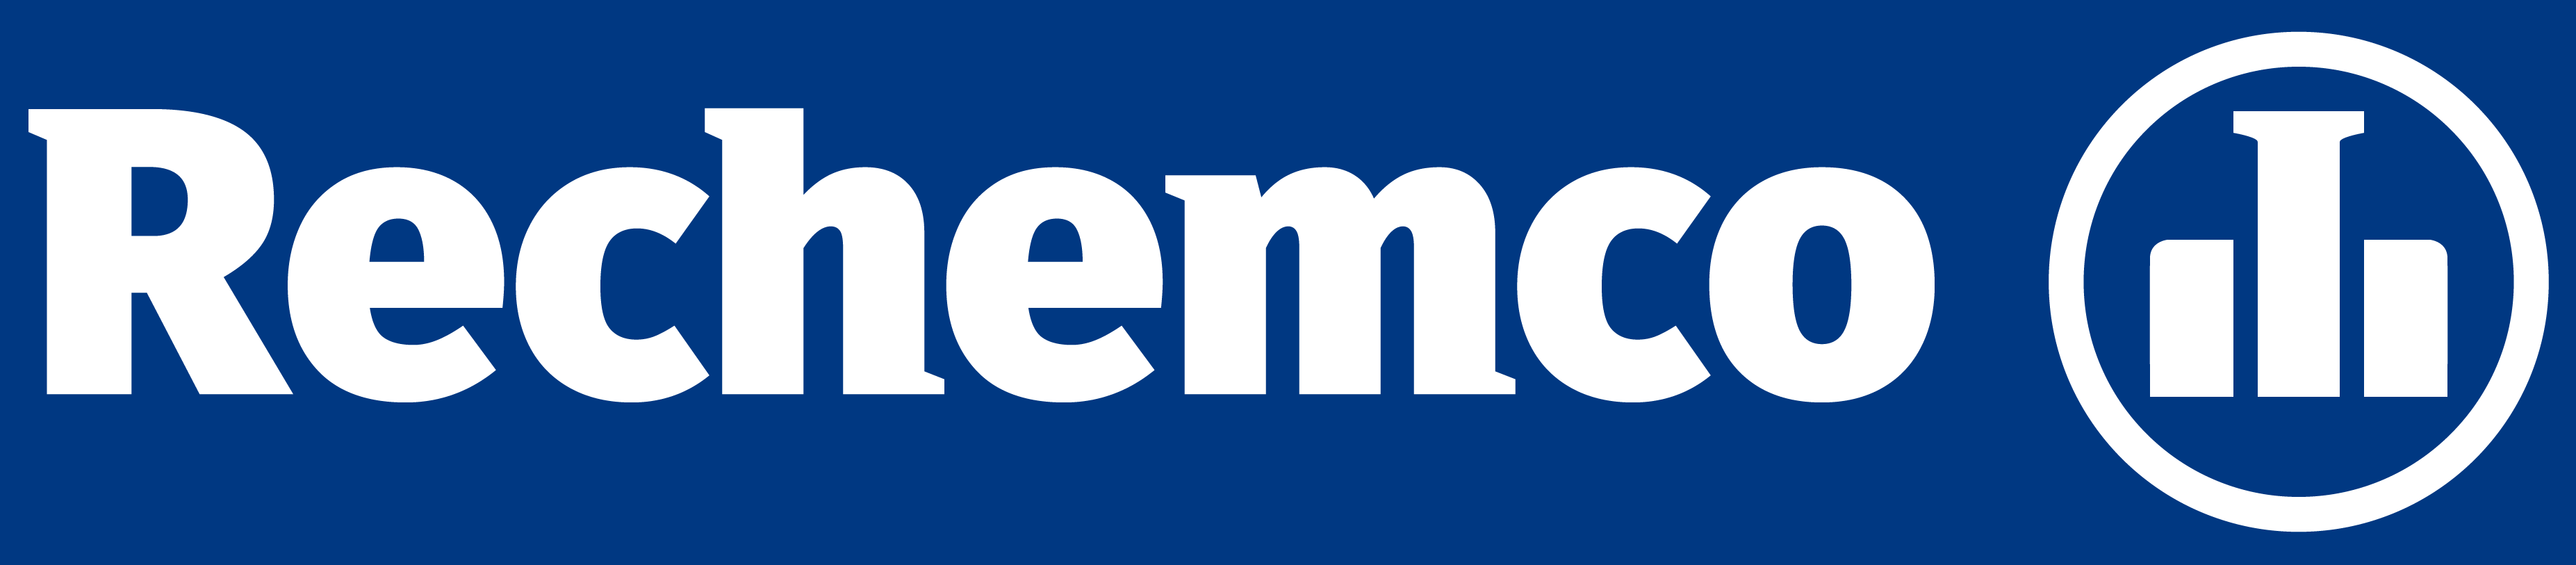 RECHEMCO